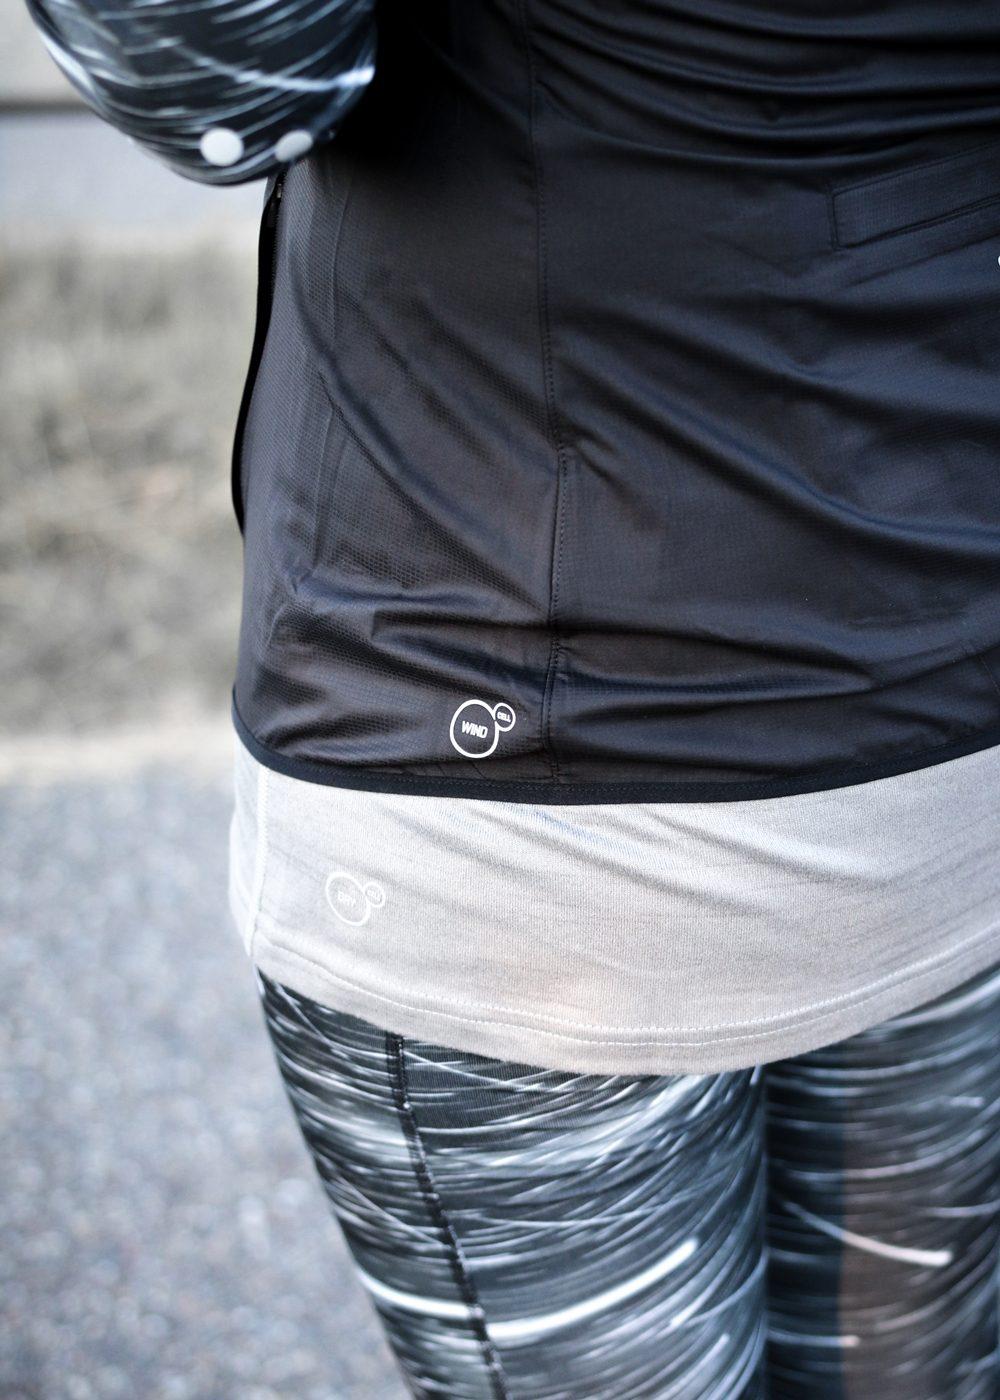 sportoutfit-puma-nightcat-reflektierende-laufjacke-hose-shirt